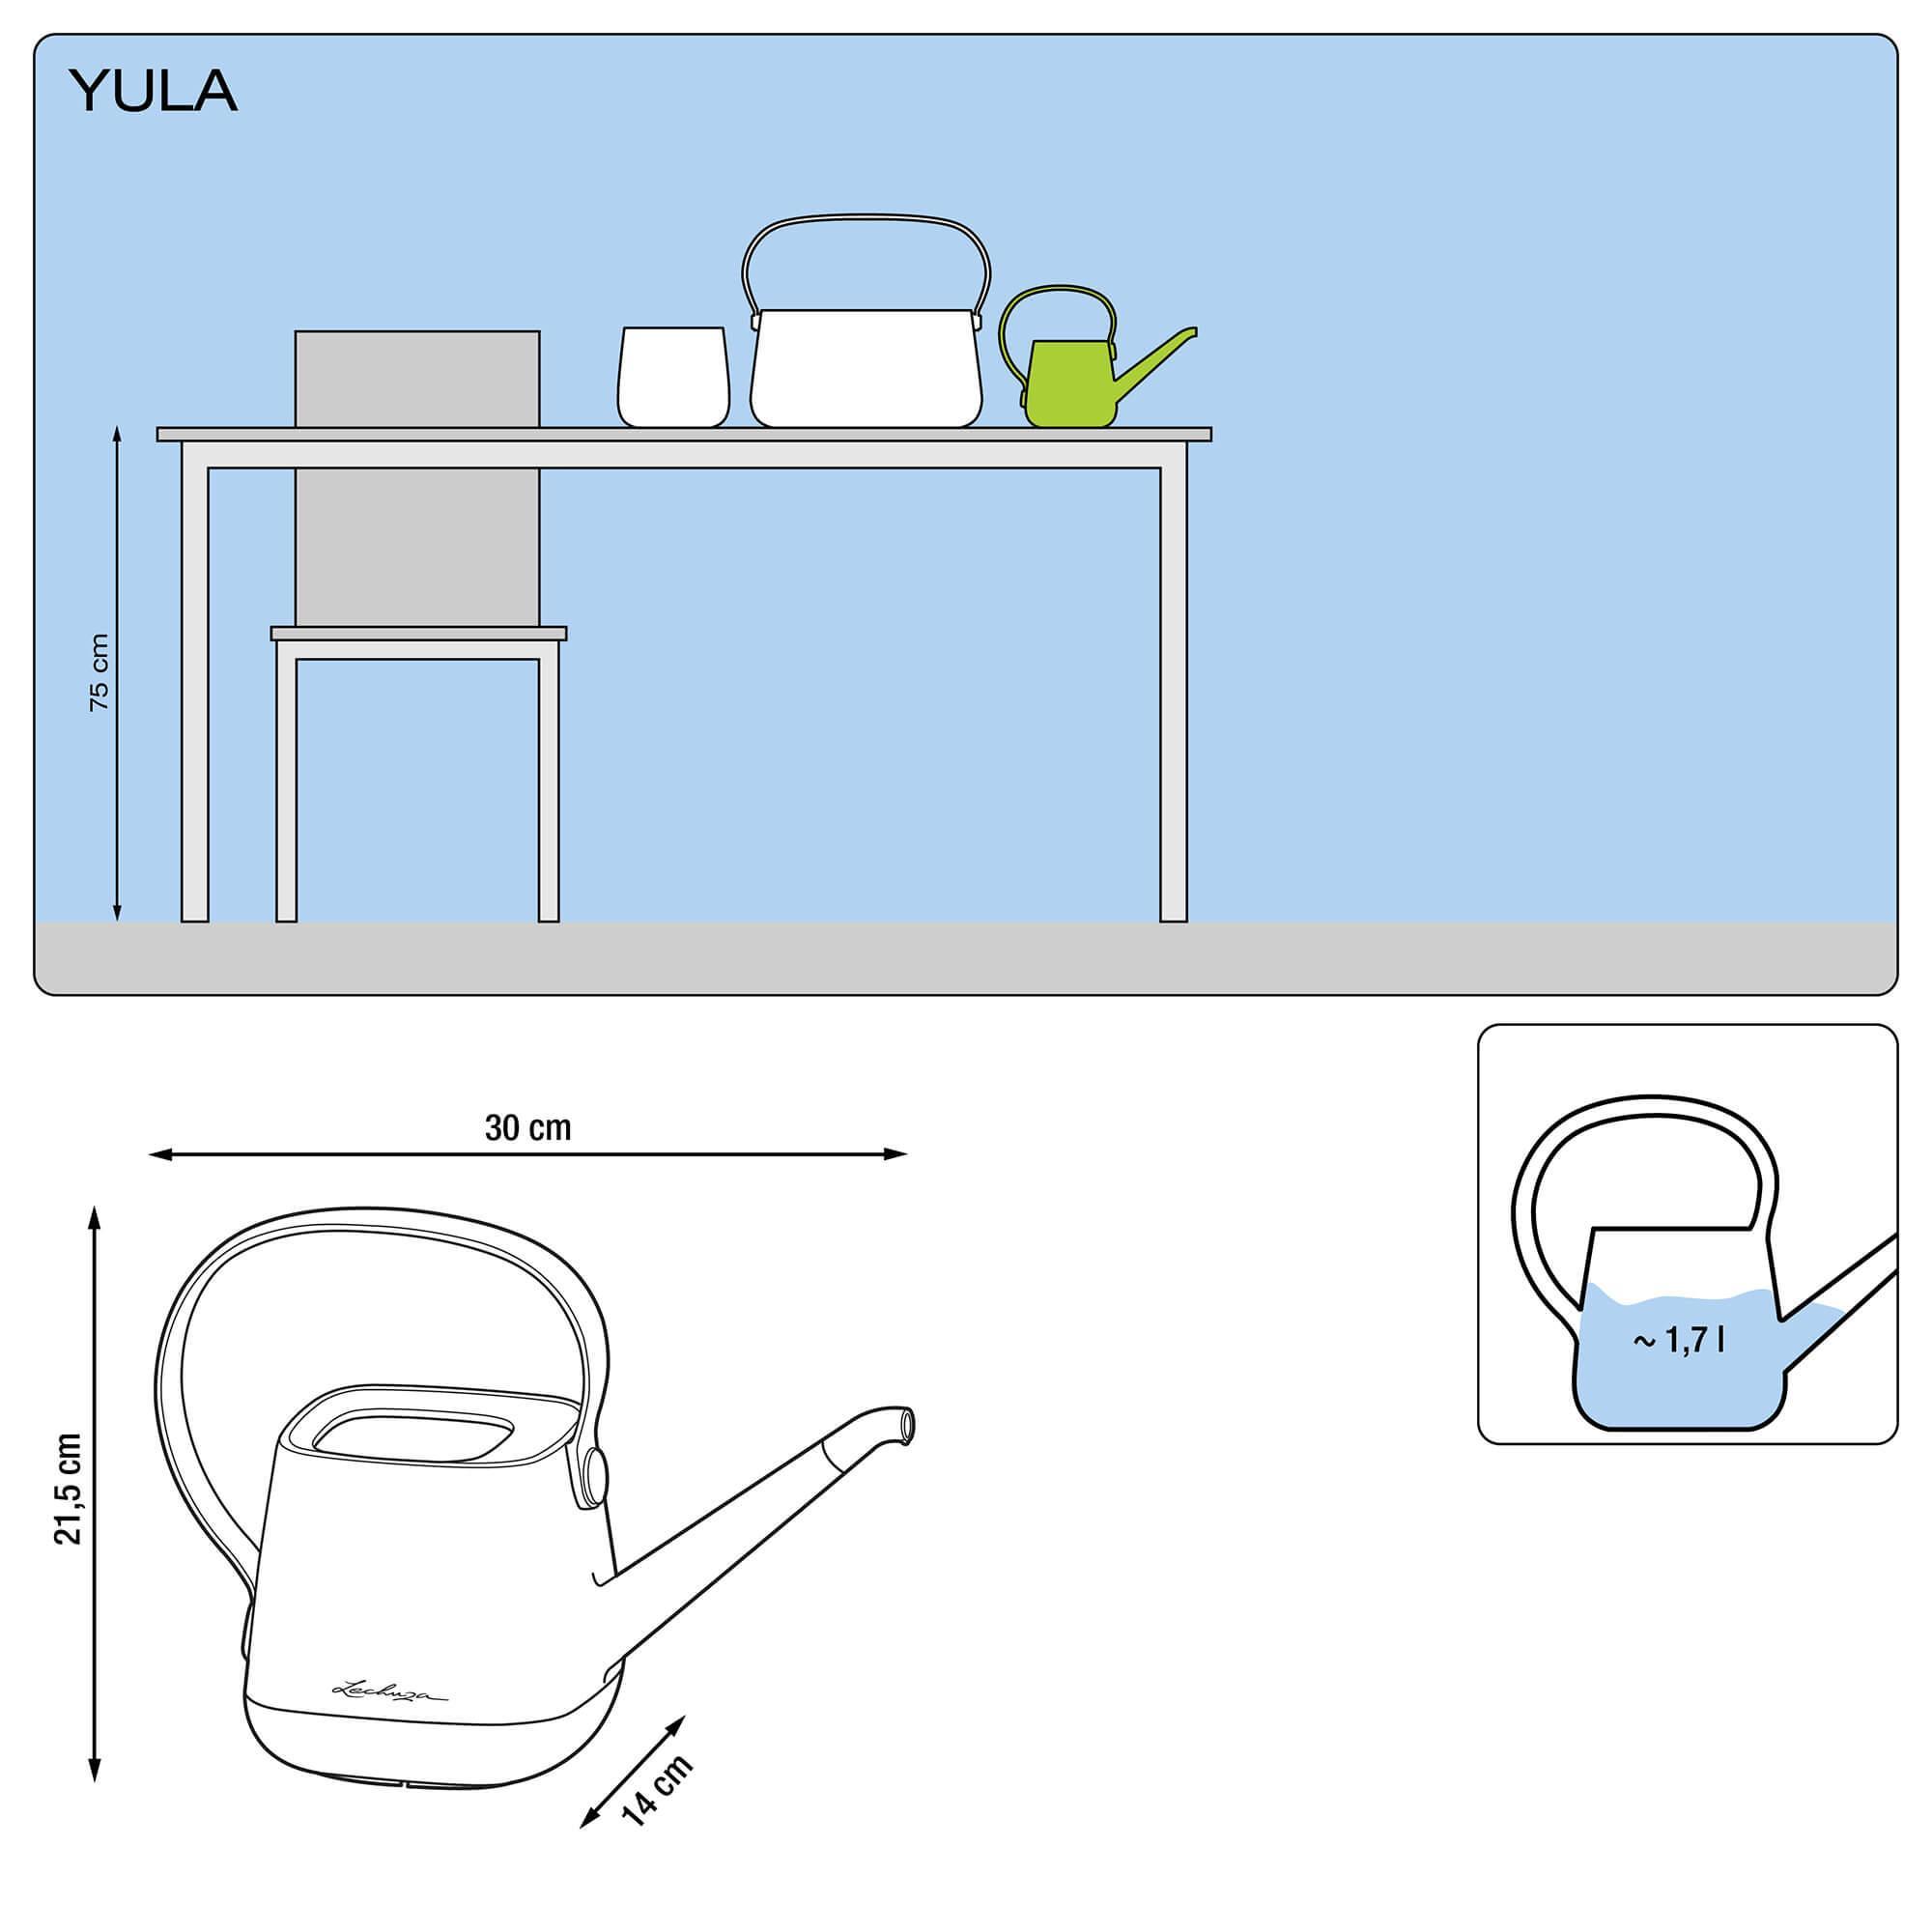 le_yula-giesskanne_product_addi_nz